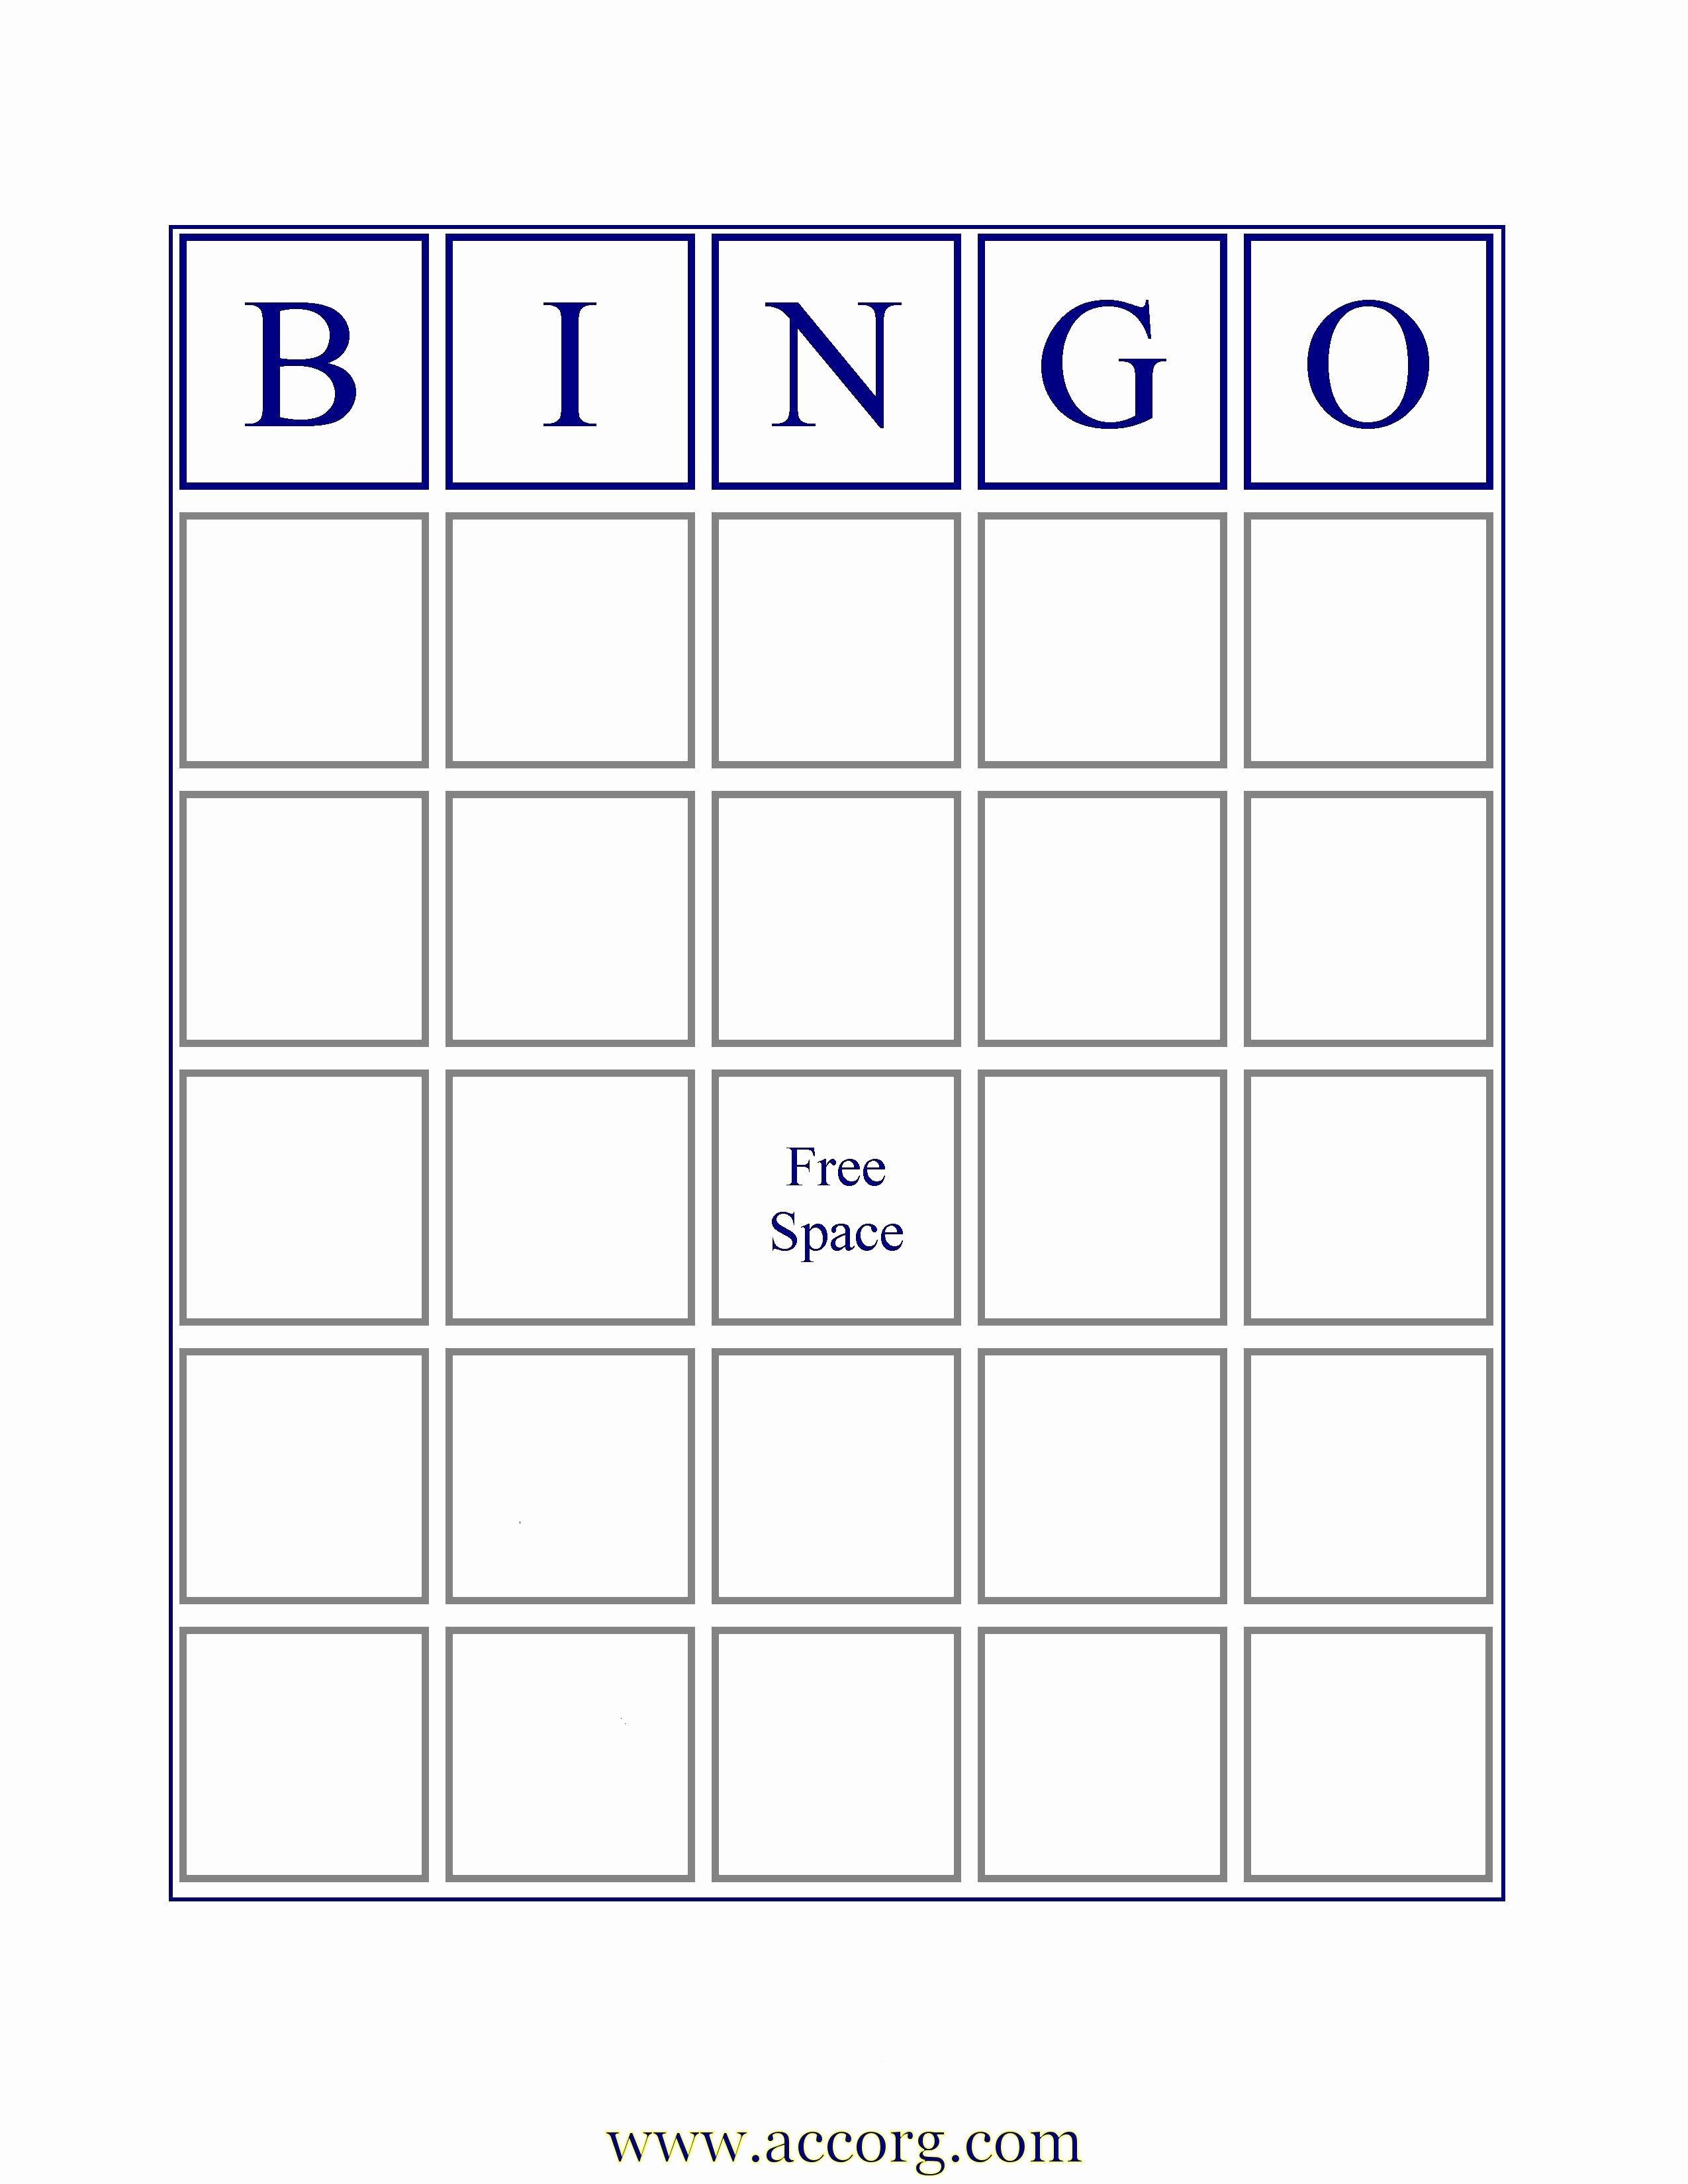 Free Blank Bingo Cards Elegant Blank Bingo Cards